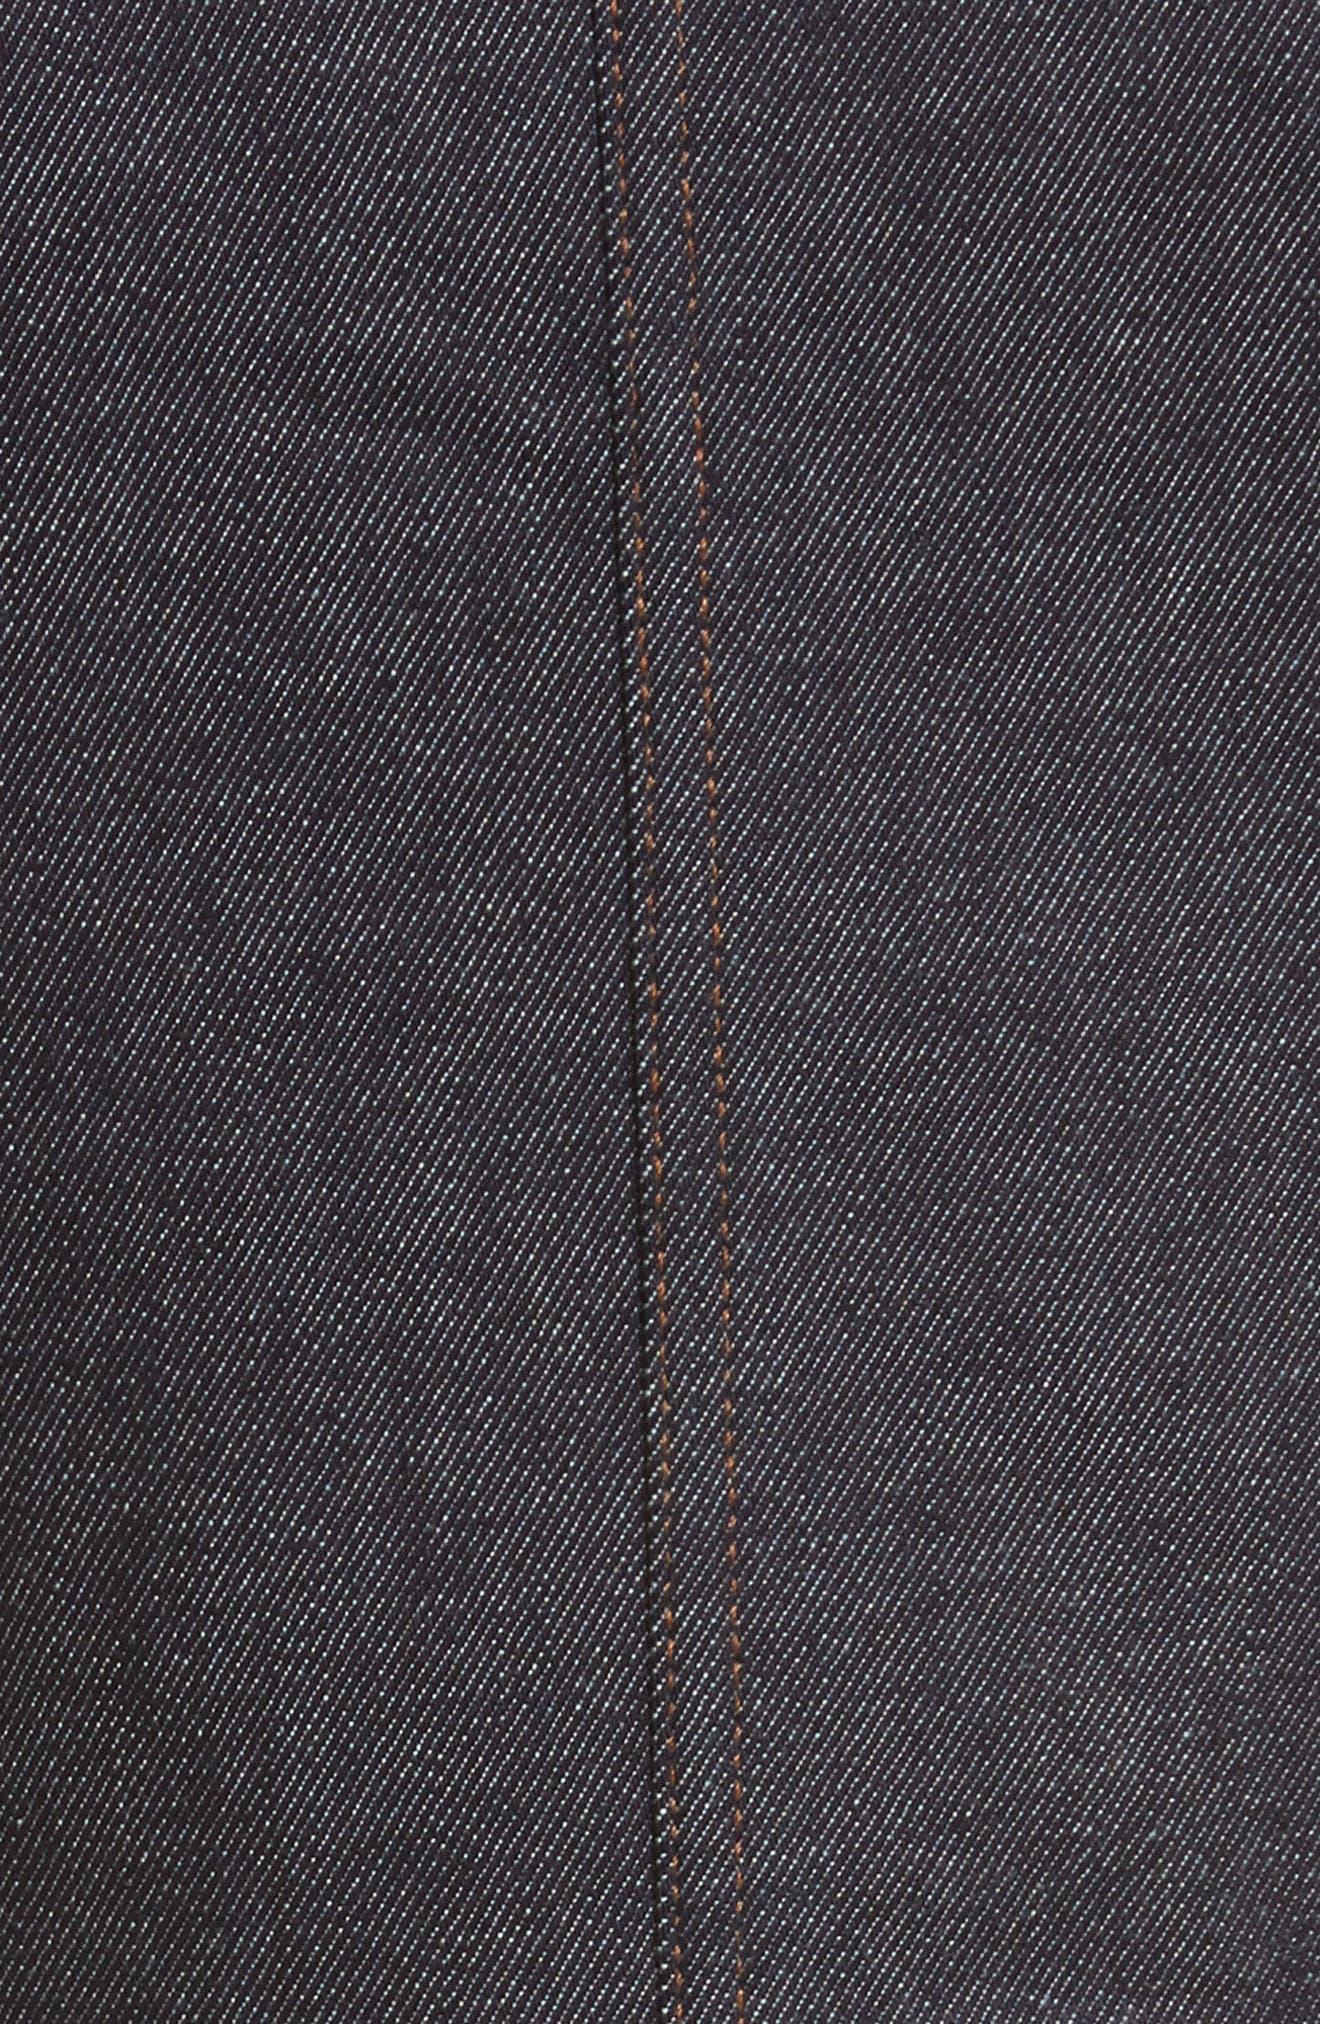 Diane von Furstenberg Front Zip Denim Dress,                             Alternate thumbnail 5, color,